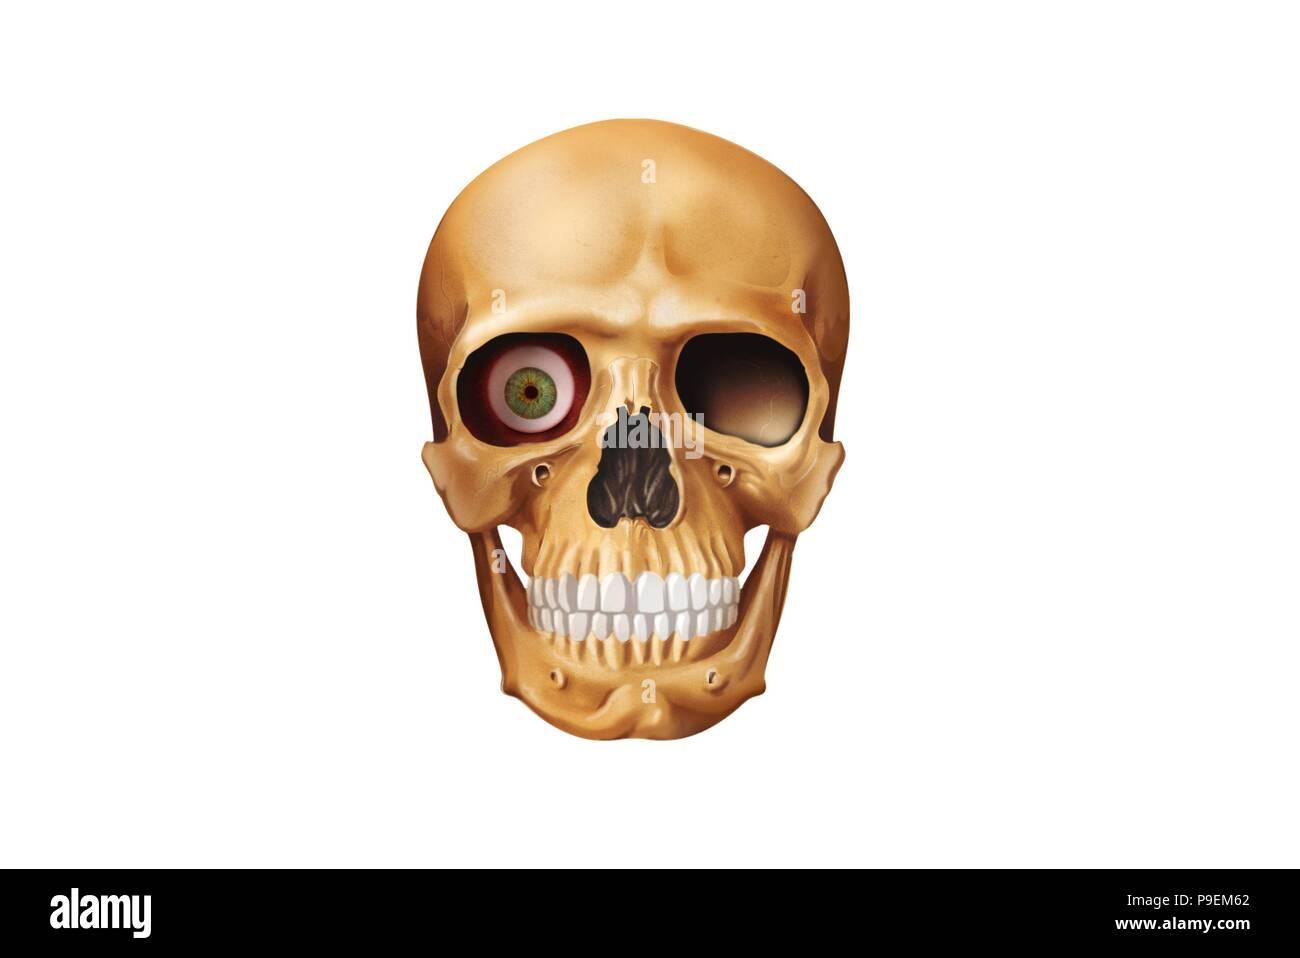 Viscerocranium. Eye socket Stock Photo: 212379498 - Alamy